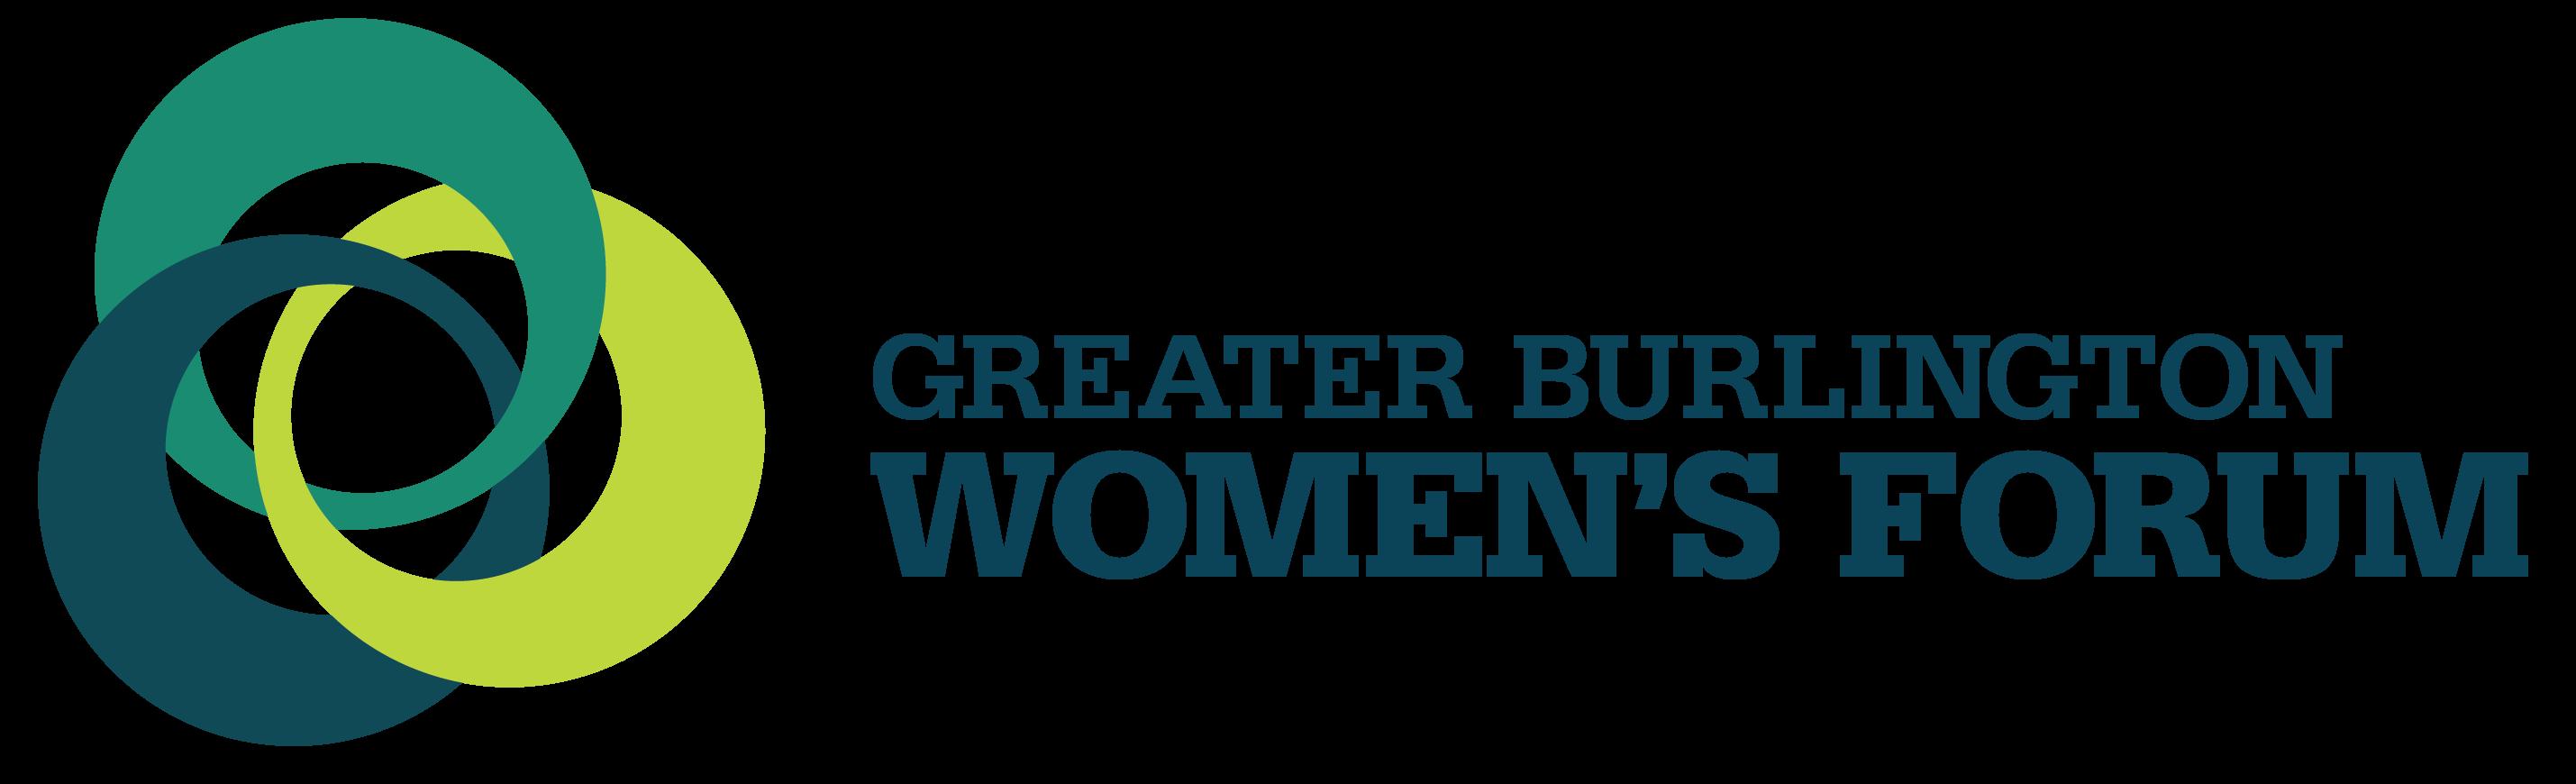 Greater Burlington Women's Forum Logo